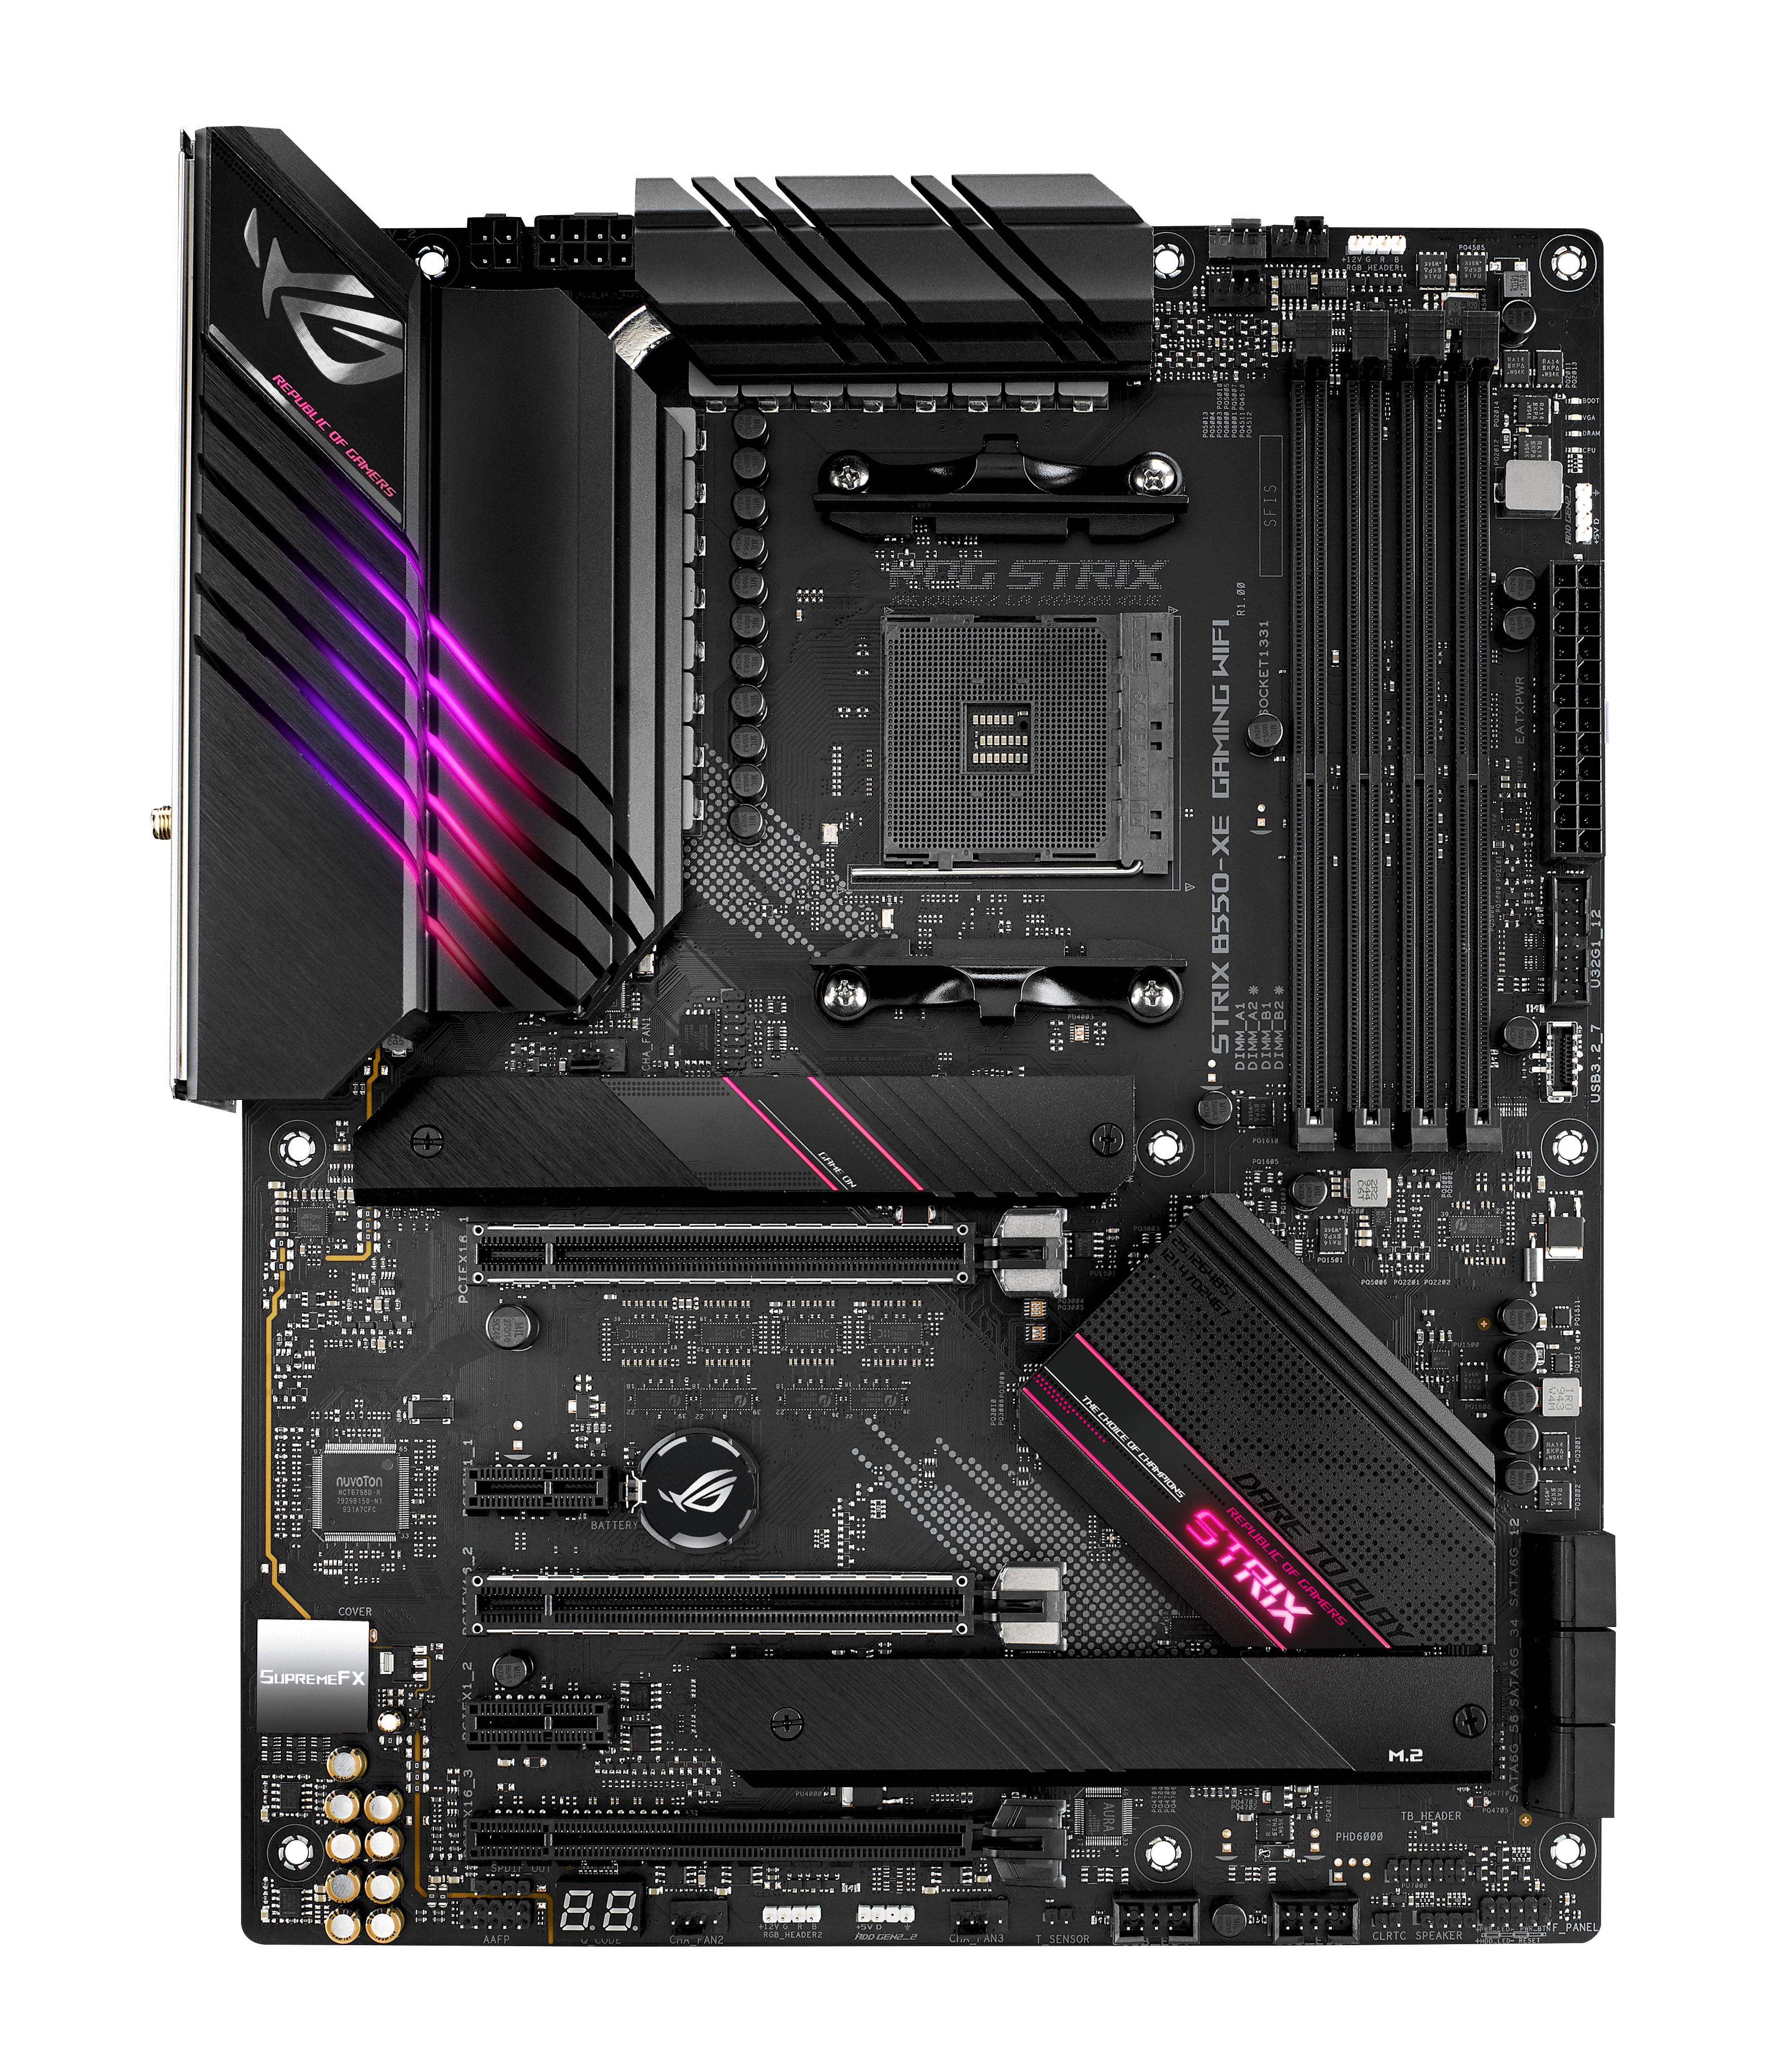 ASUS ROG STRIX B550-XE GAMING WIFI - AMD - AMD Ryzen 3,AMD Ryzen 5 - DDR4-SDRAM - DIMM - 3866,4000,4133,4266,4400,4600,4800,5100 MHz - 128 GB